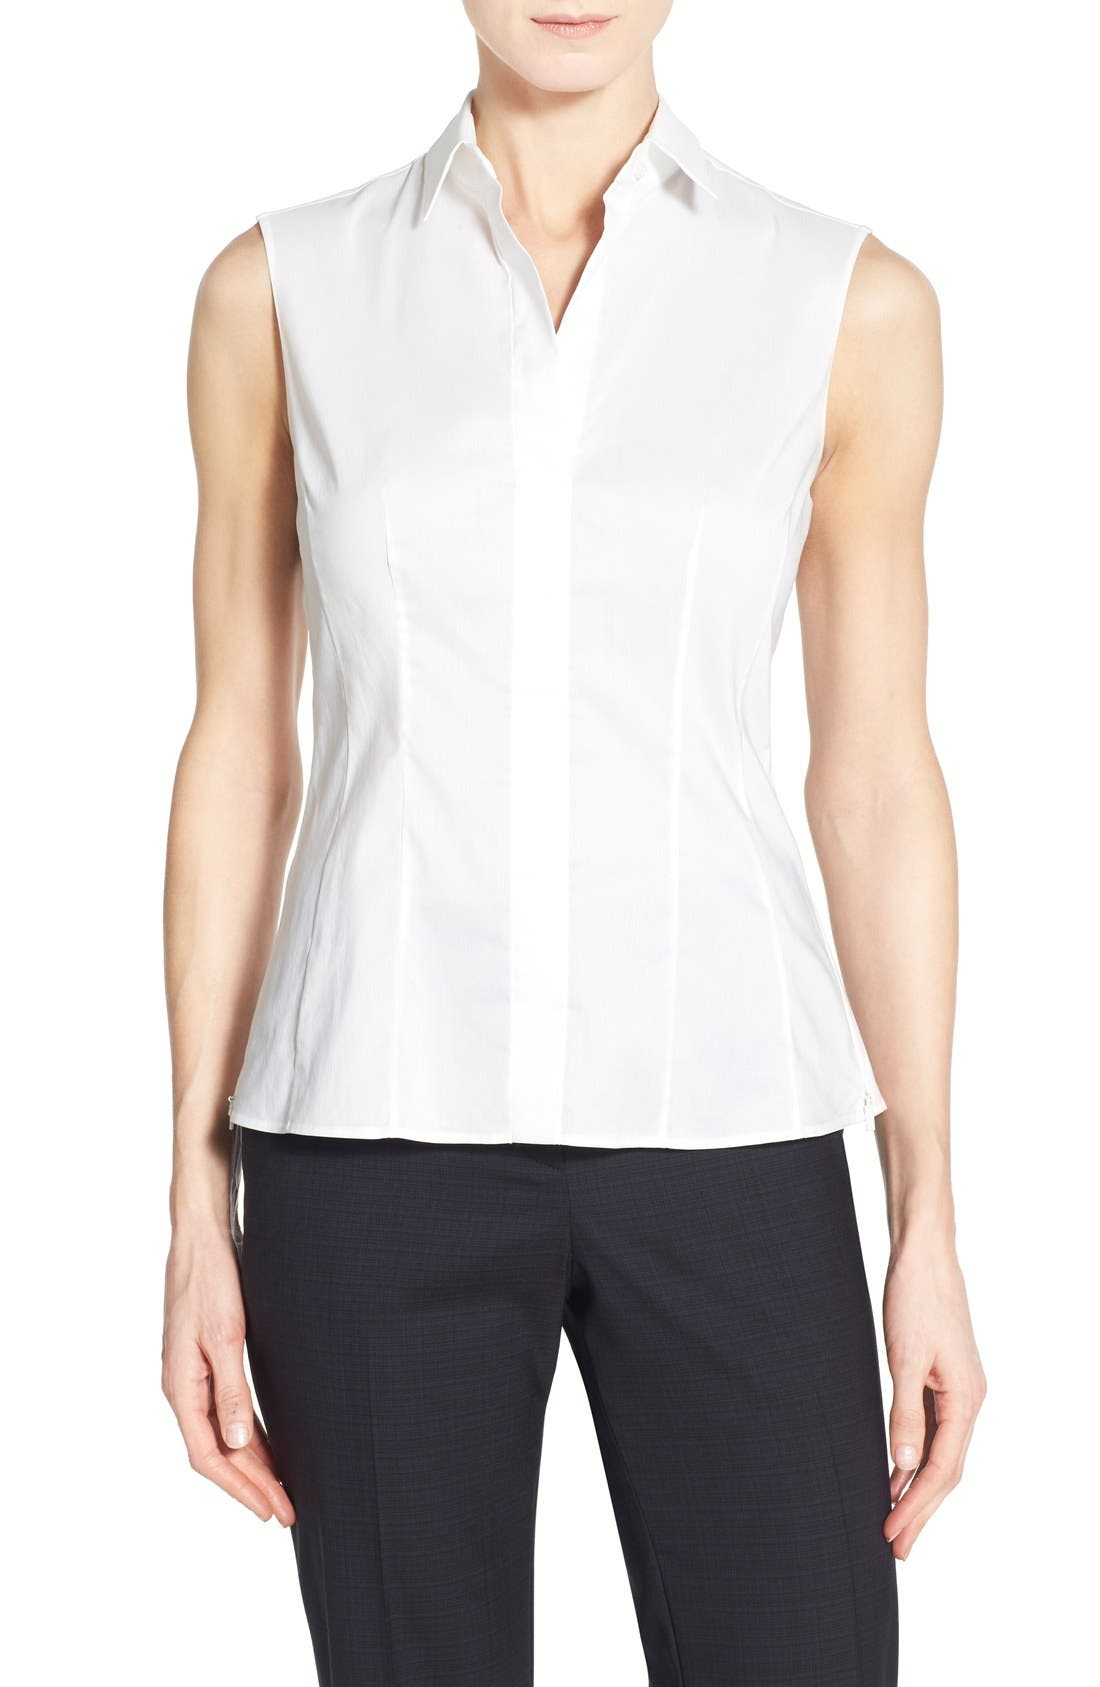 Alternate Image 1 Selected - BOSS 'Bashiva' Sleeveless Poplin Shirt (Regular & Petite)